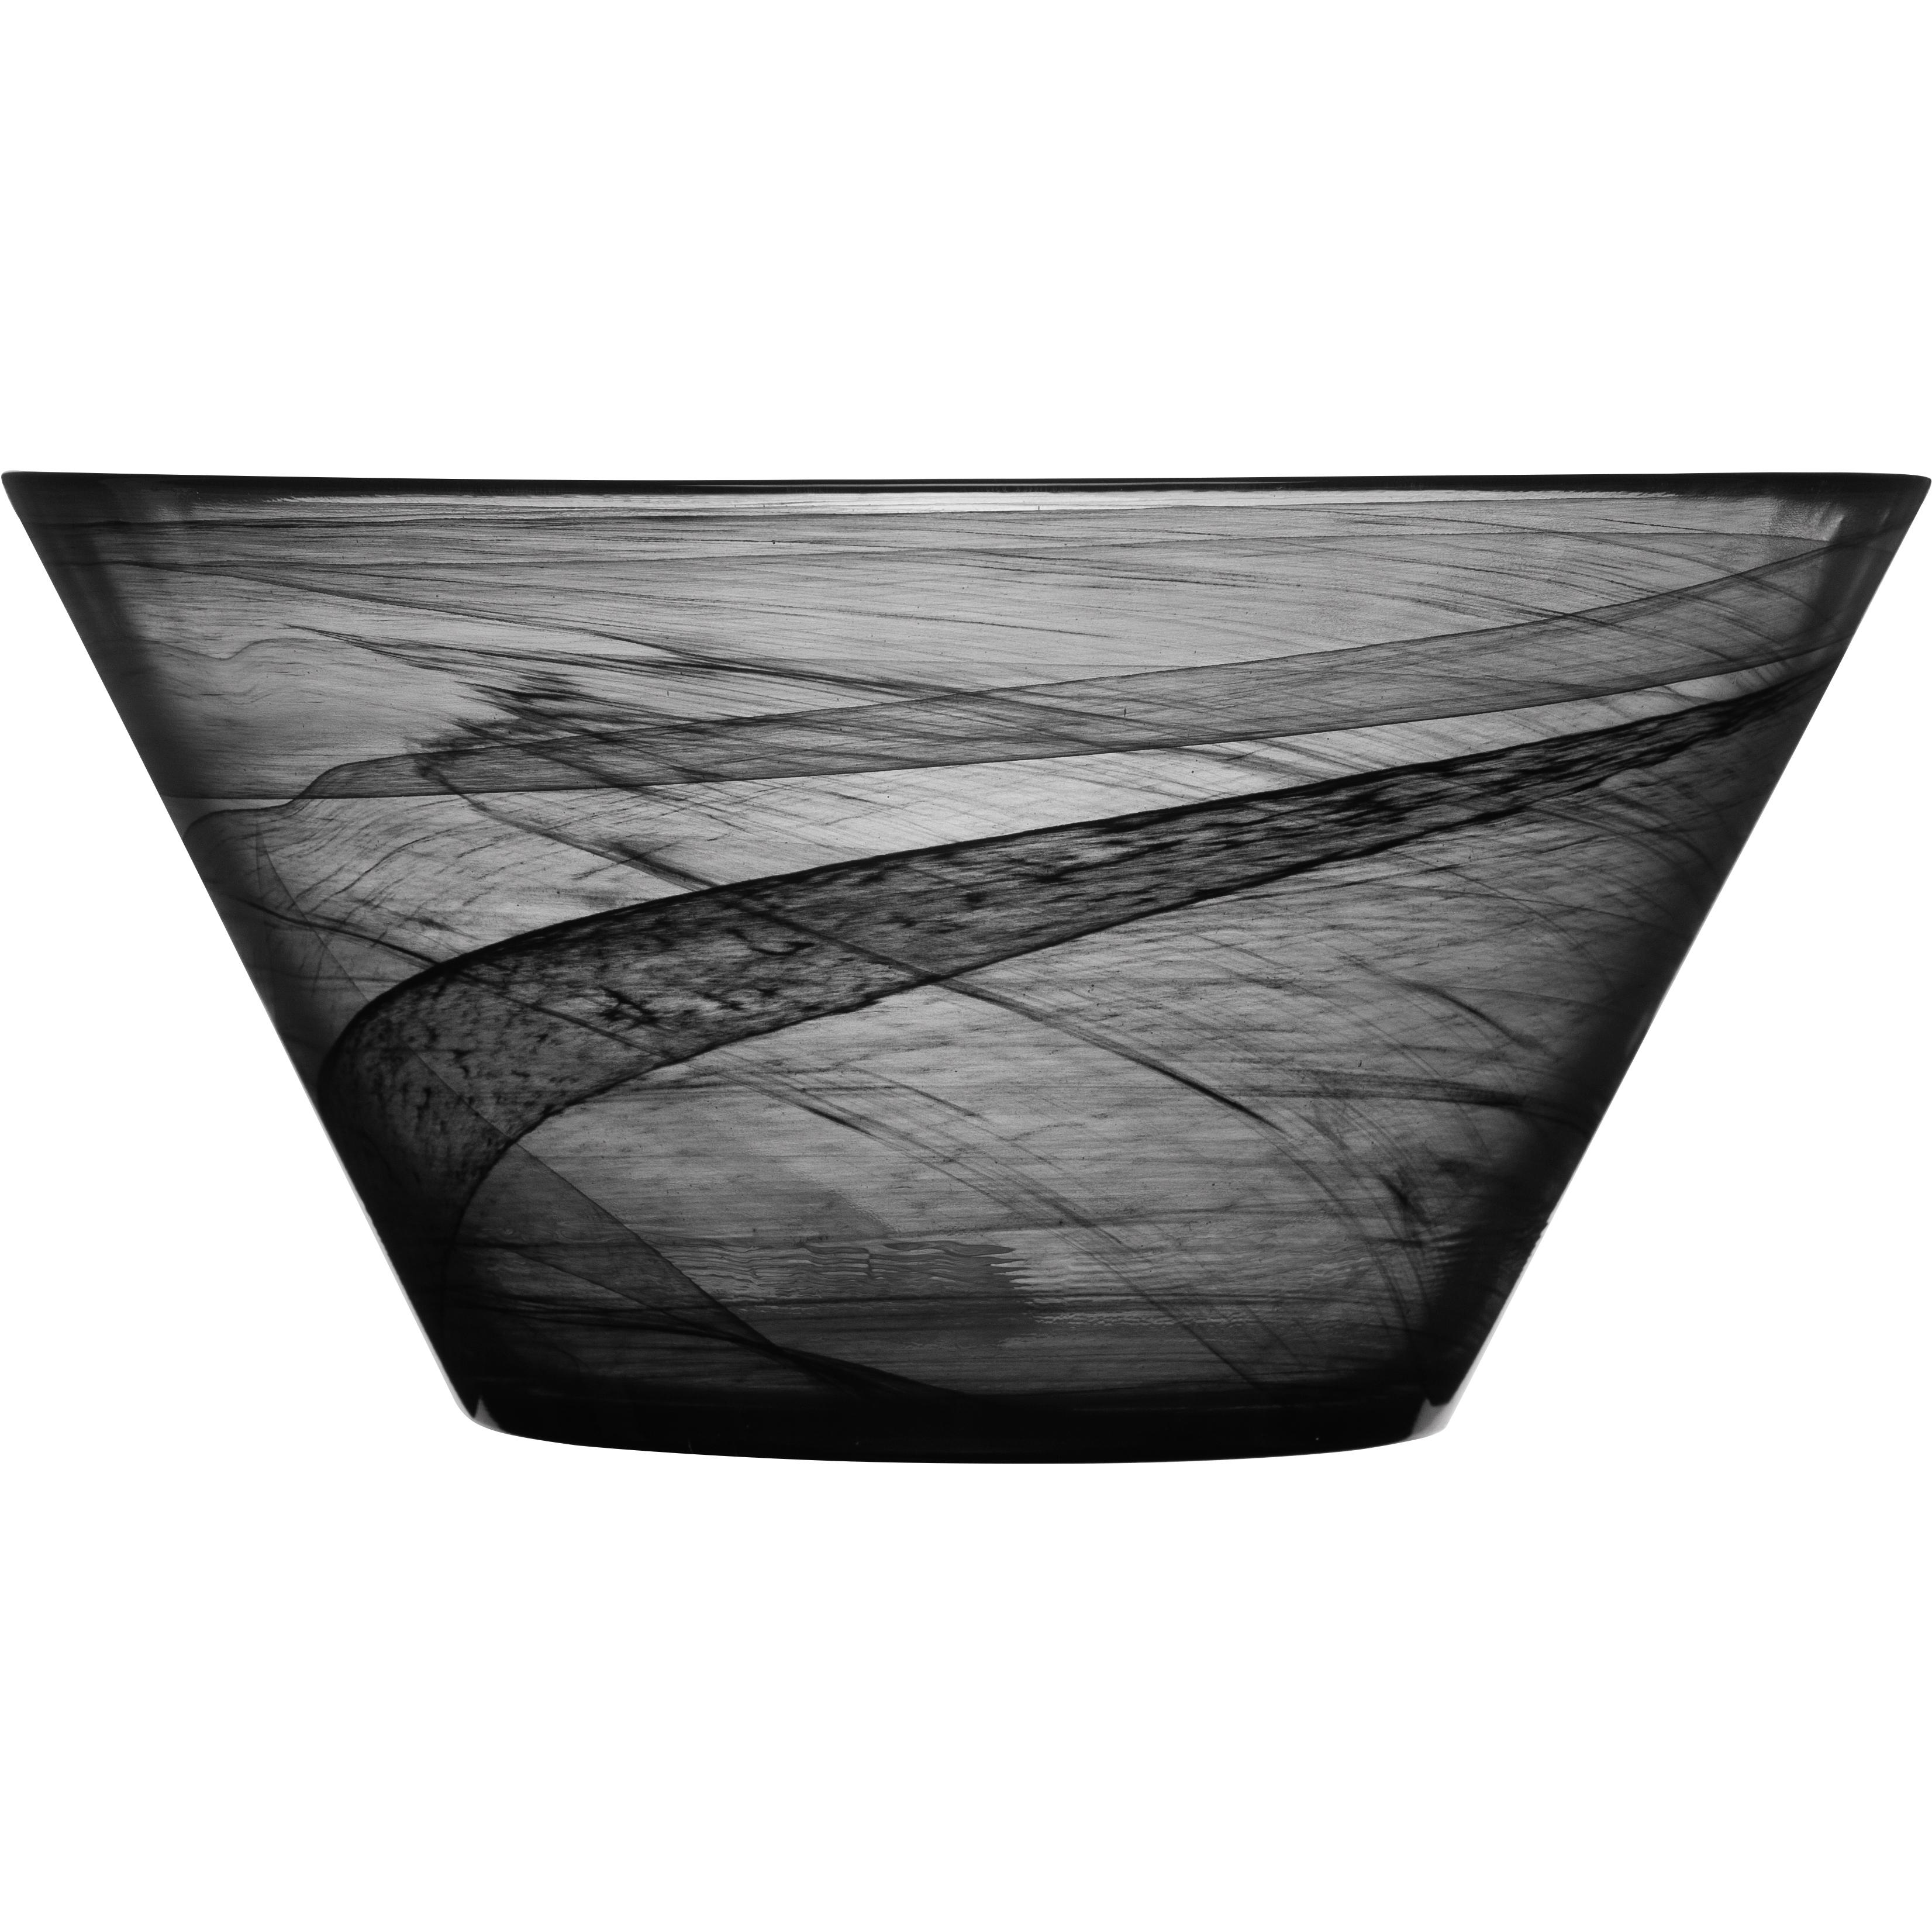 SEAglasbruk Black and White Black Glass Serving Bowl